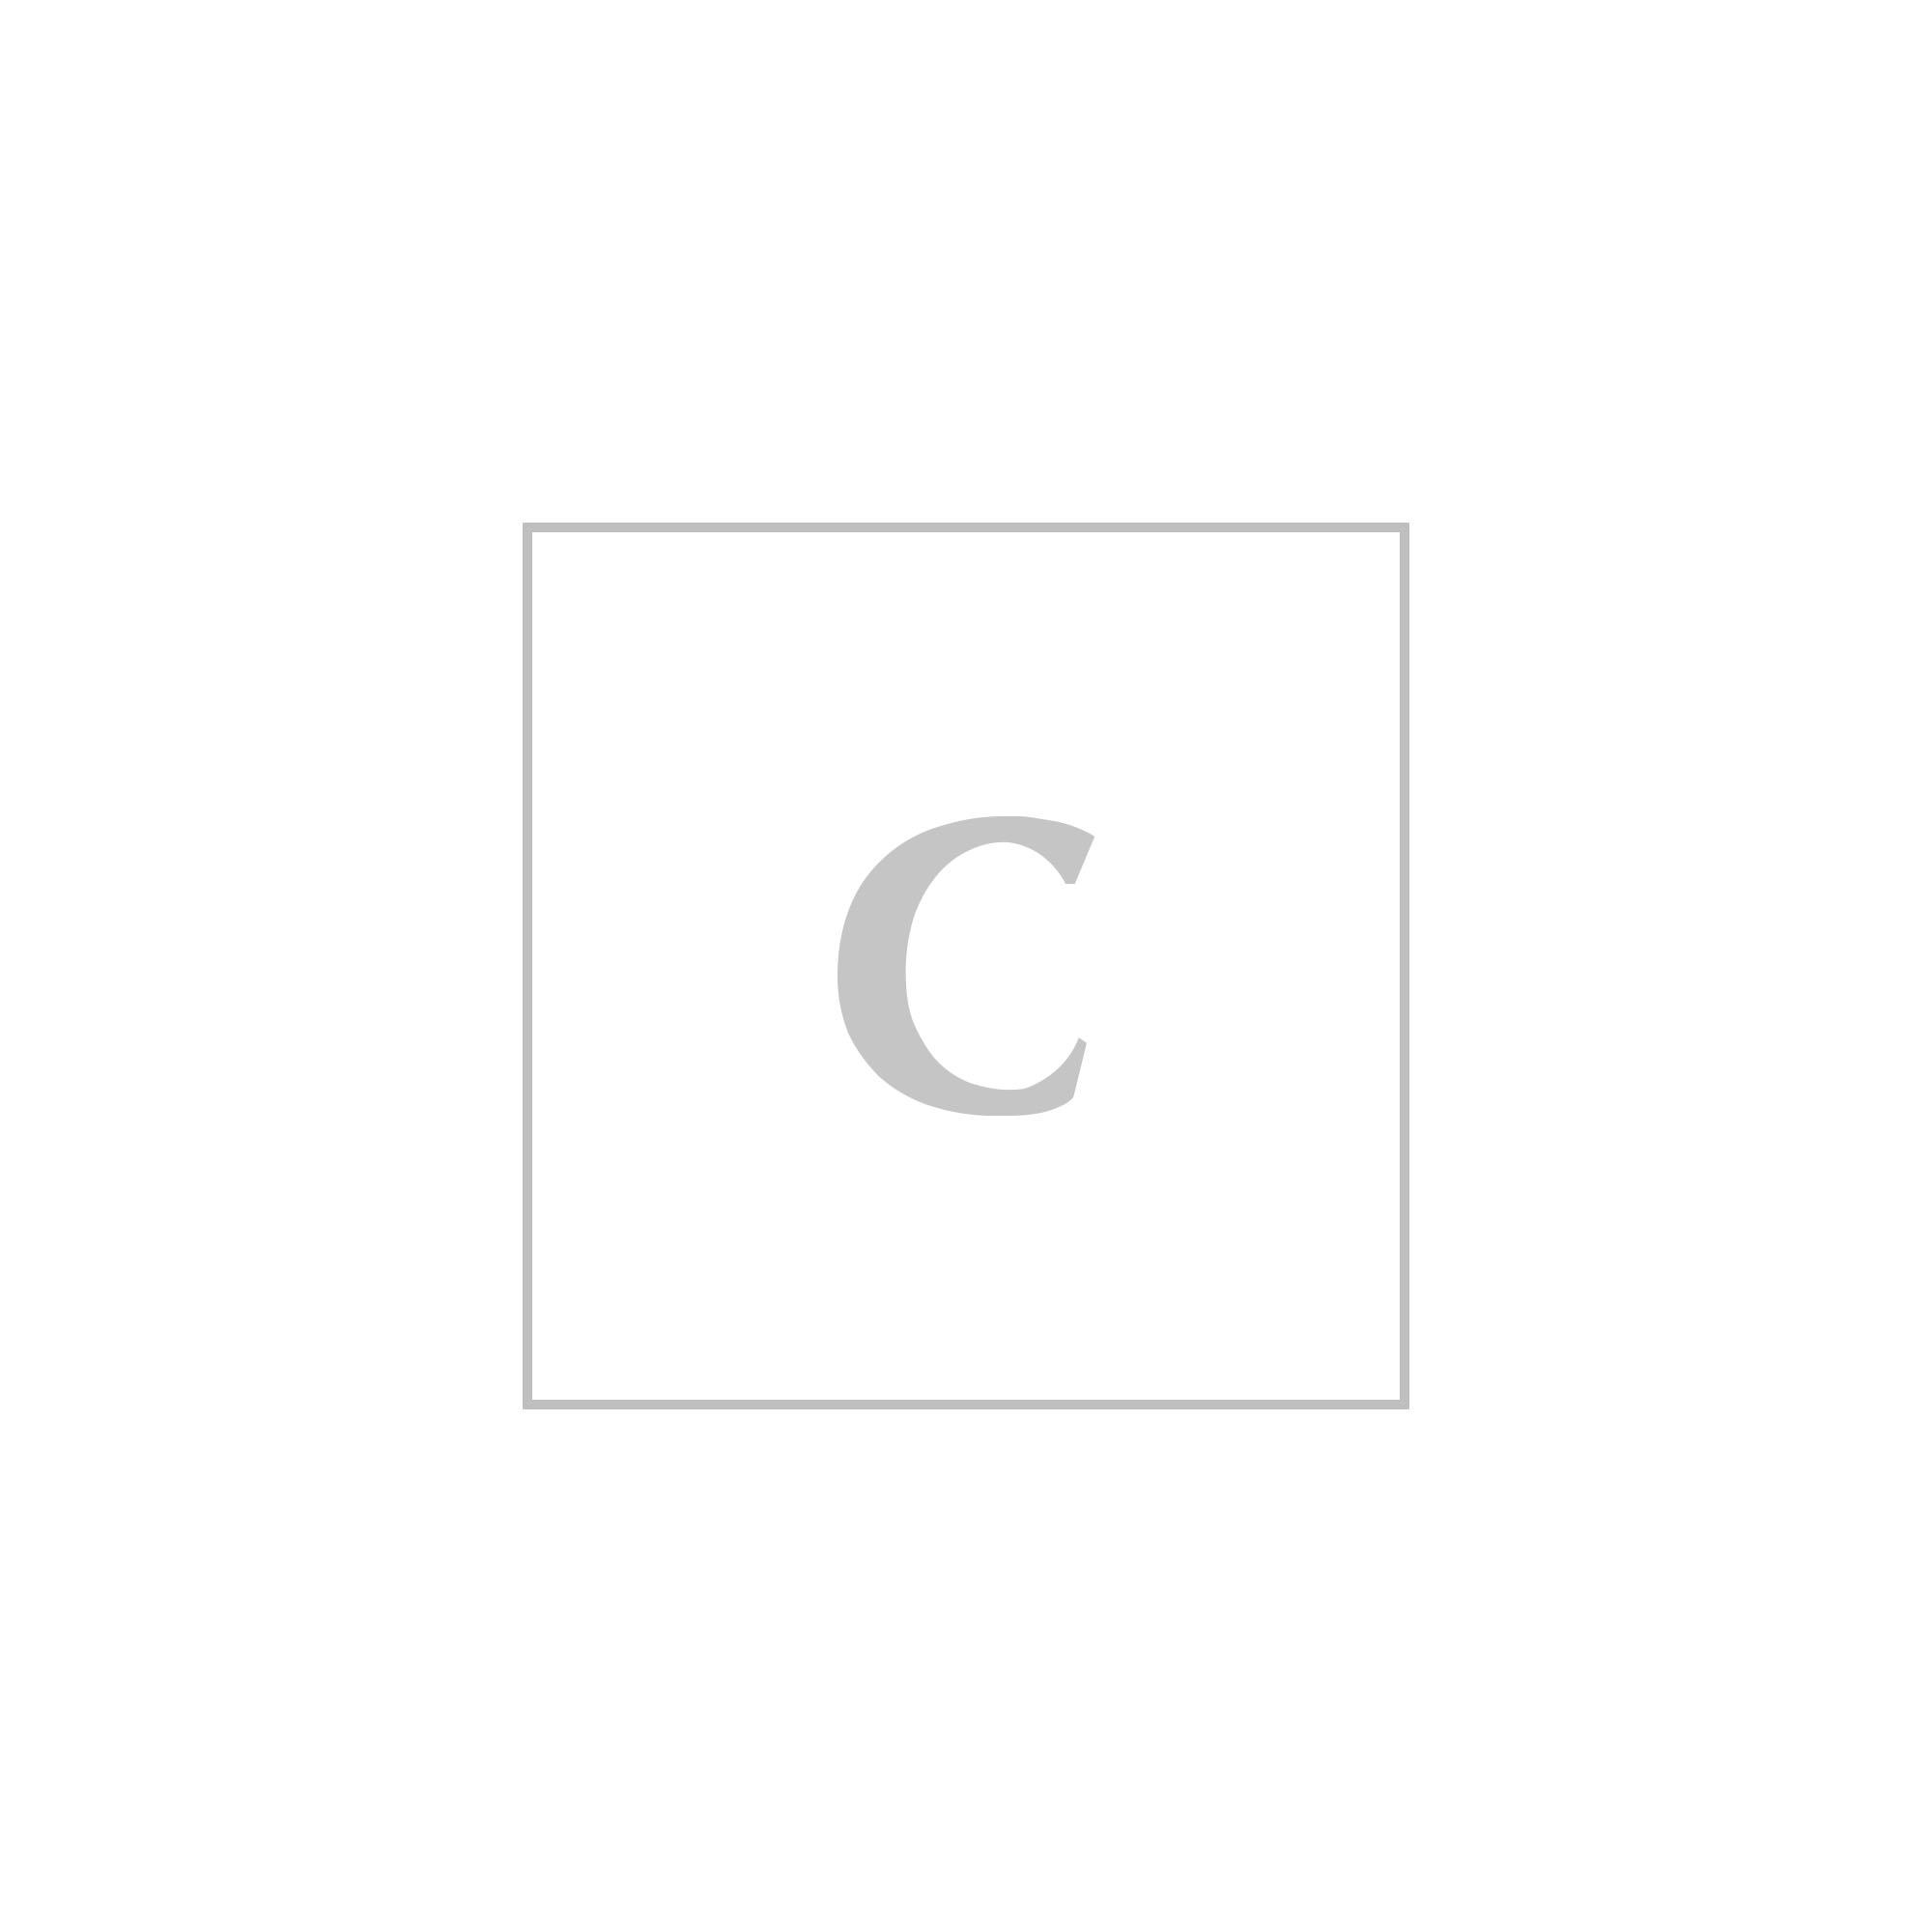 Christian Dior borsa lady dior croisiere cannage lambsk